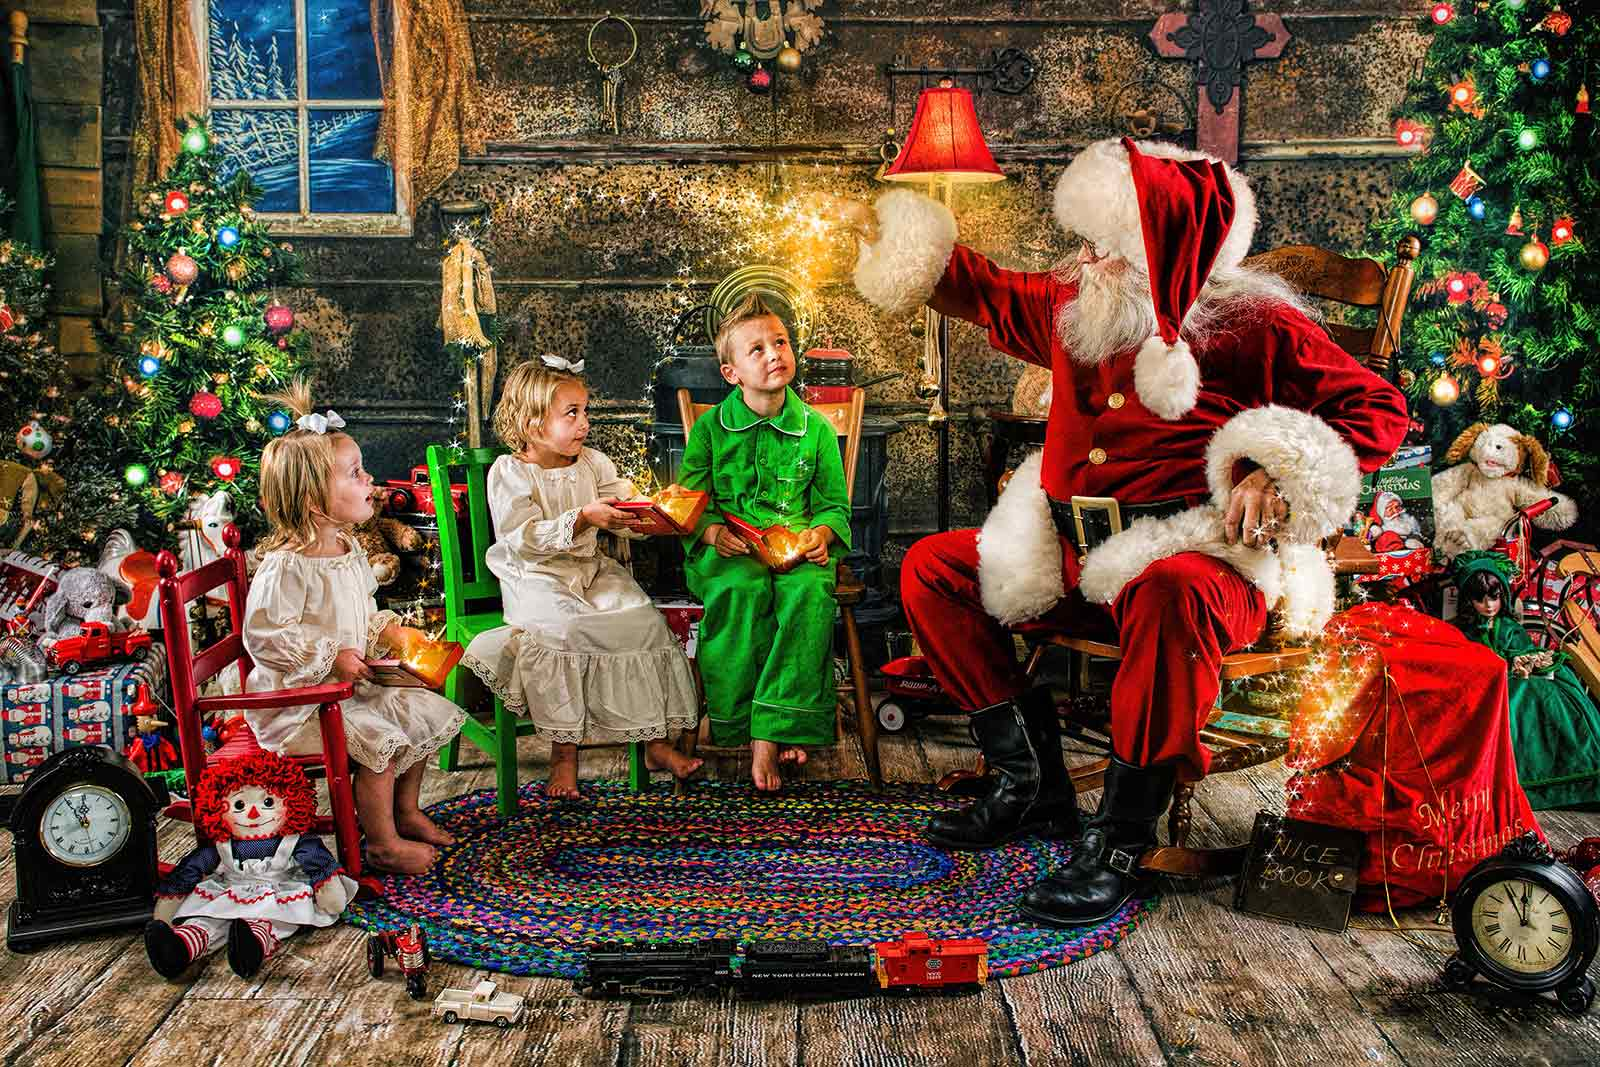 022_Magic-of-Santa-Anna-Thielen-Photography